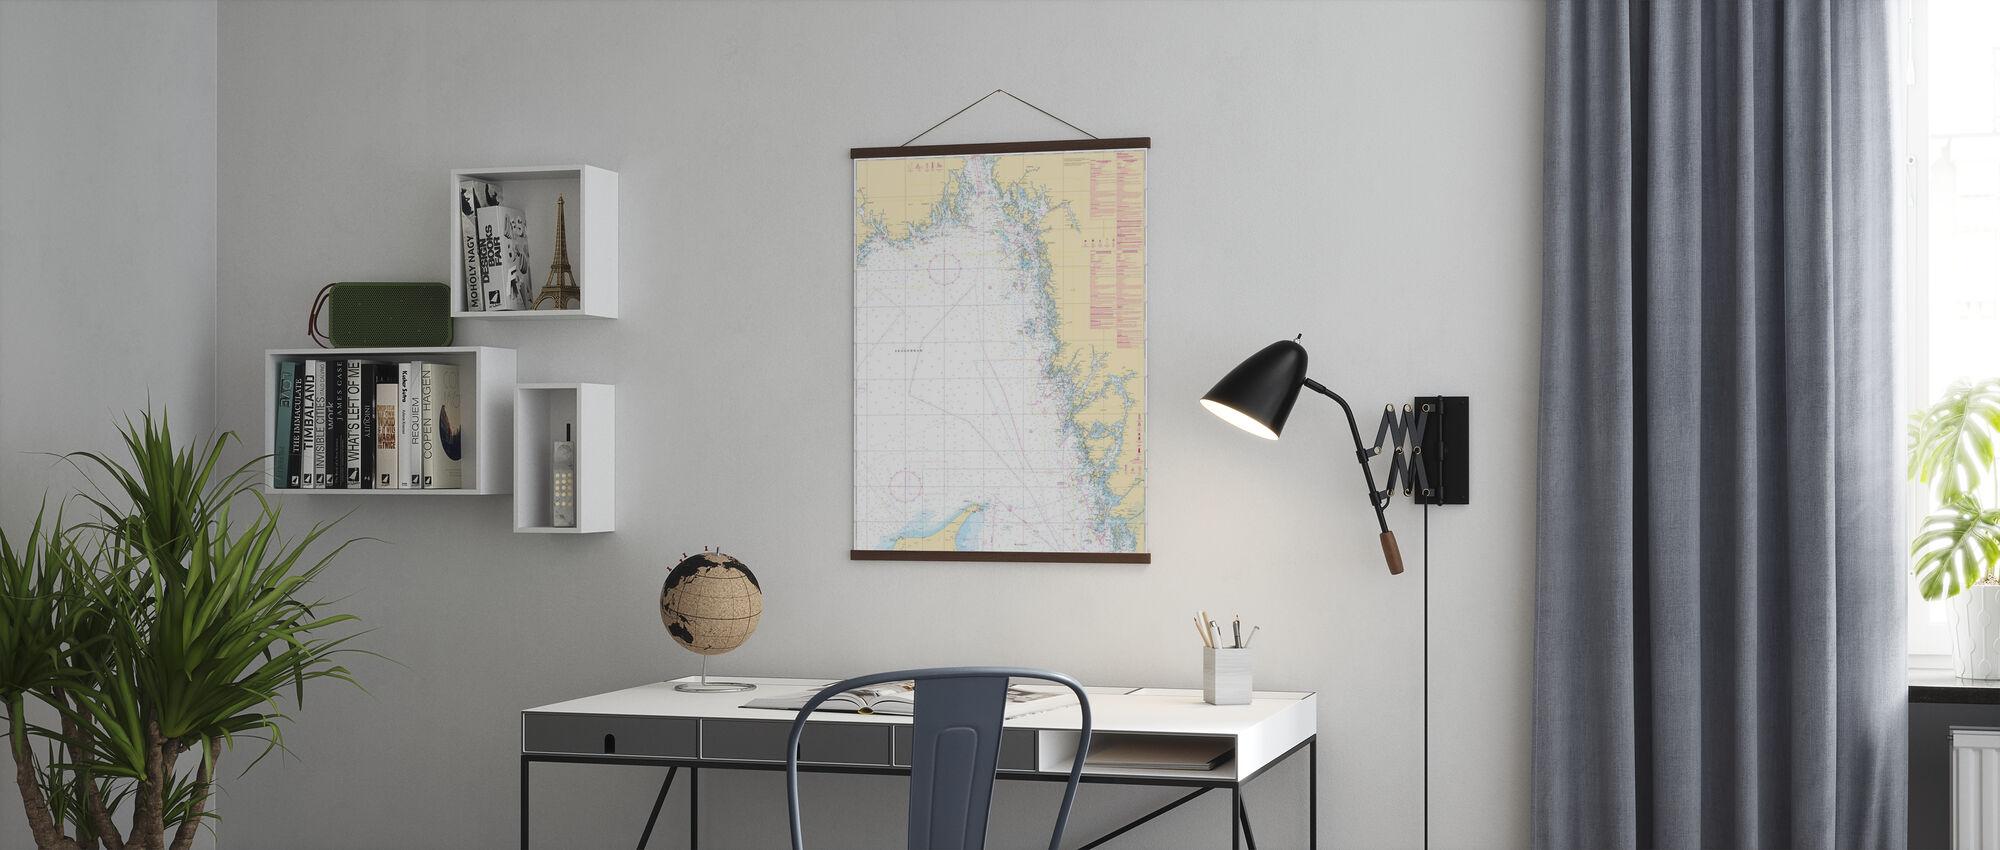 Sea Chart 93 - Skagerrak - Poster - Office